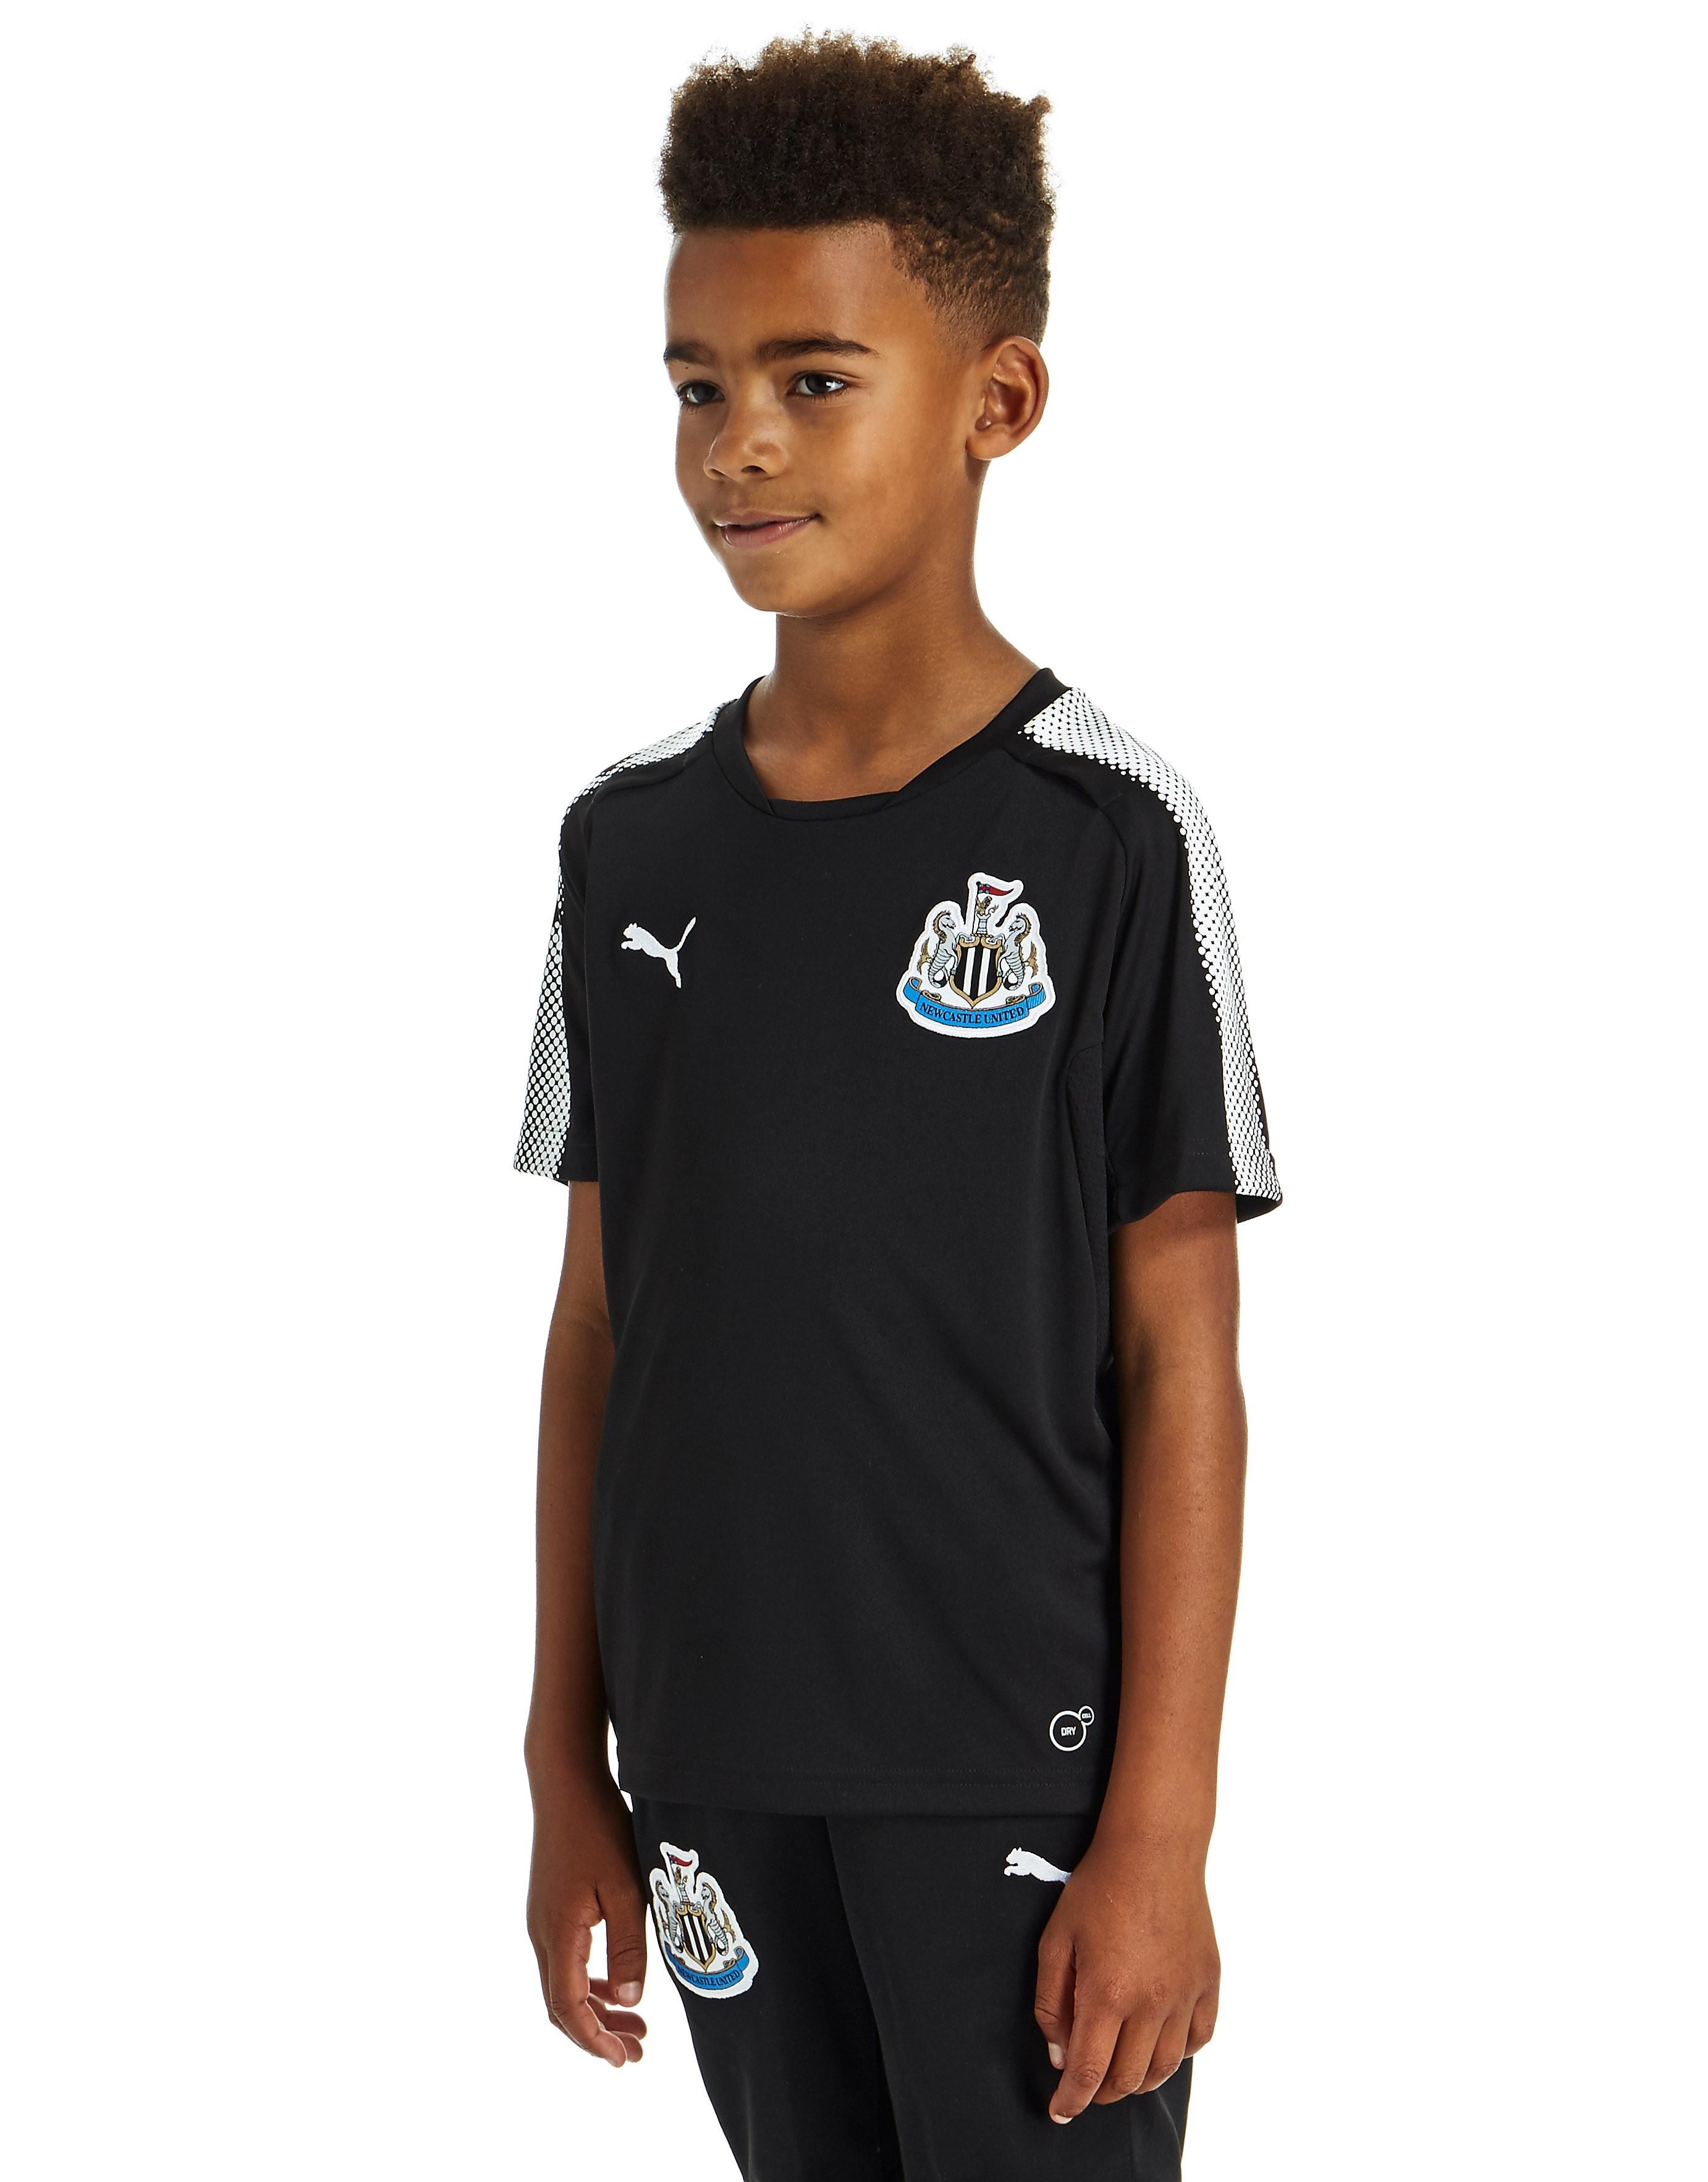 PUMA Newcastle United 2017/18 Training Shirt Junior